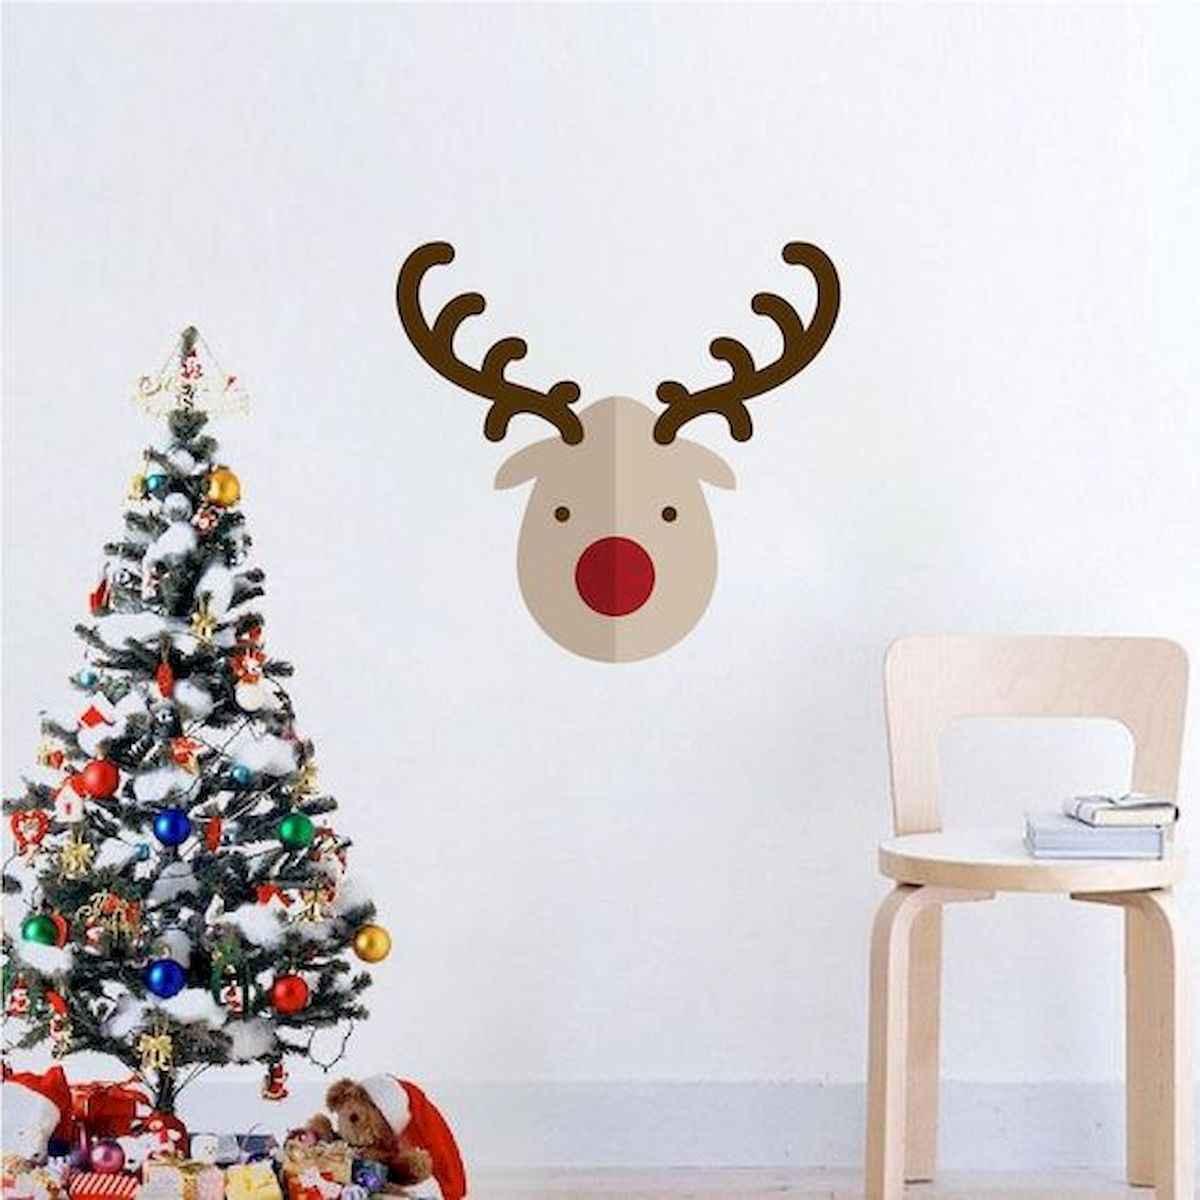 35 Awesome Apartment Christmas Decor Ideas (1)